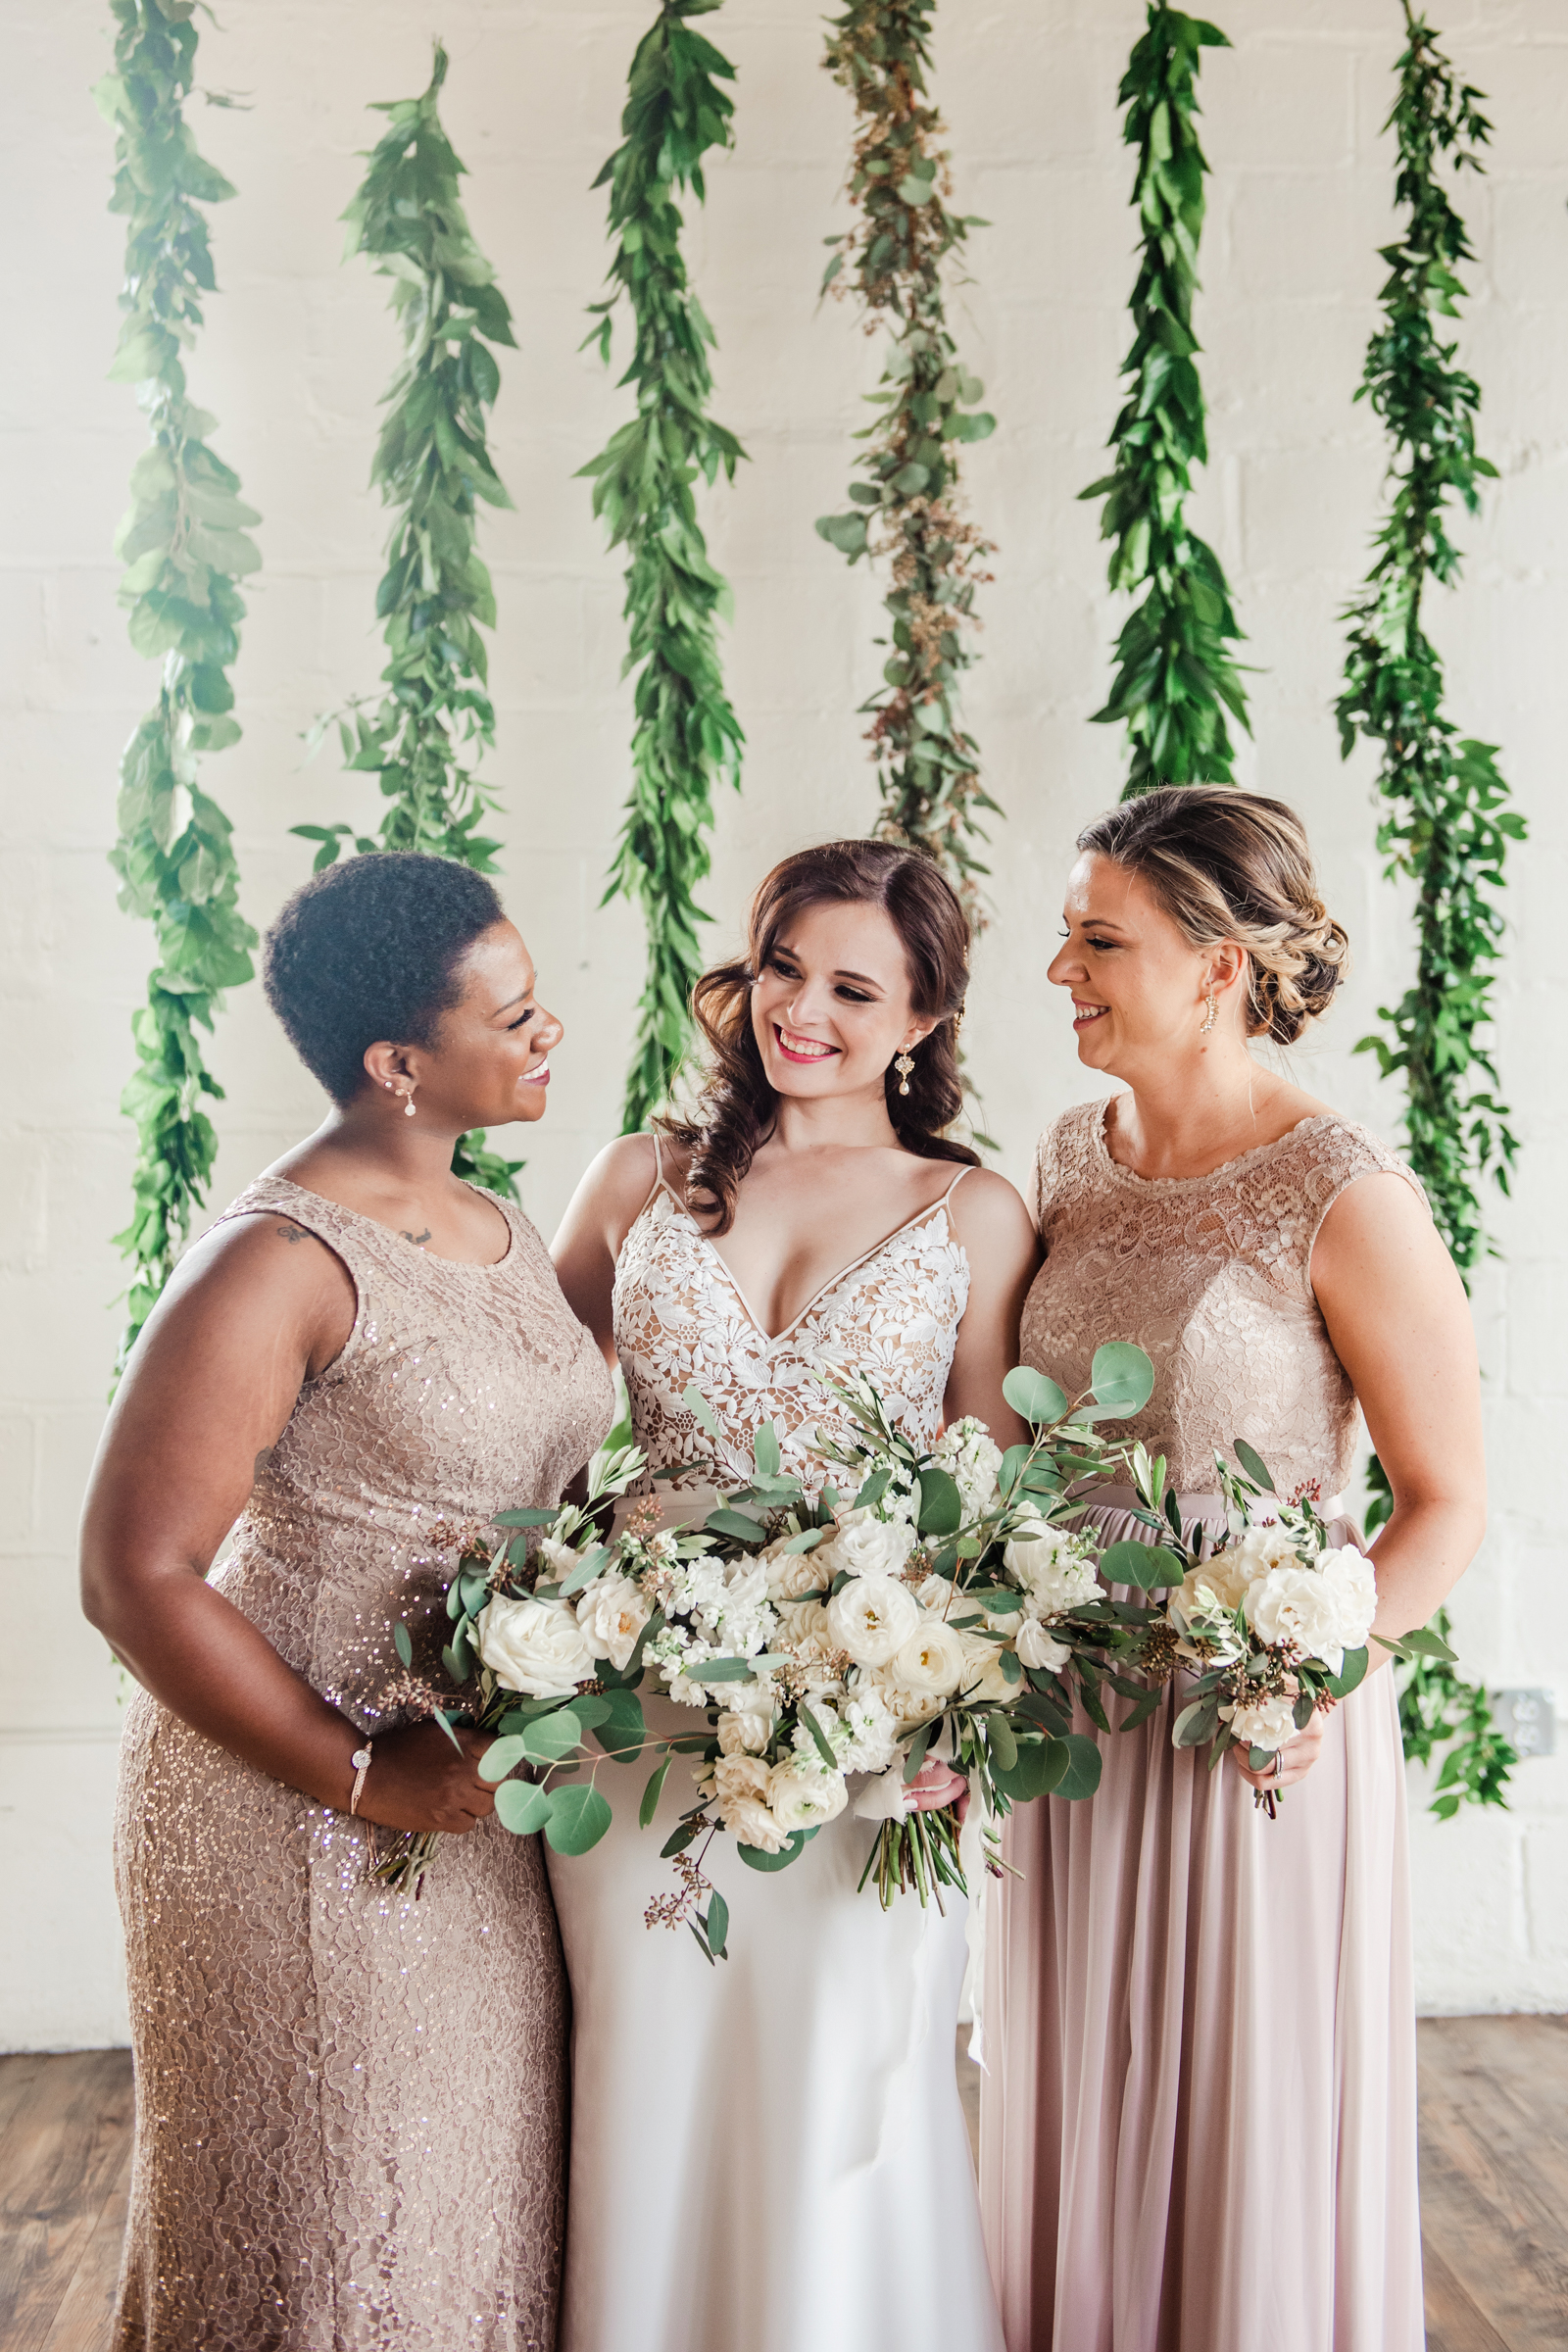 The_Arbor_LoftRochester_Wedding_JILL_STUDIO_Rochester_NY_Photographer_162758.jpg